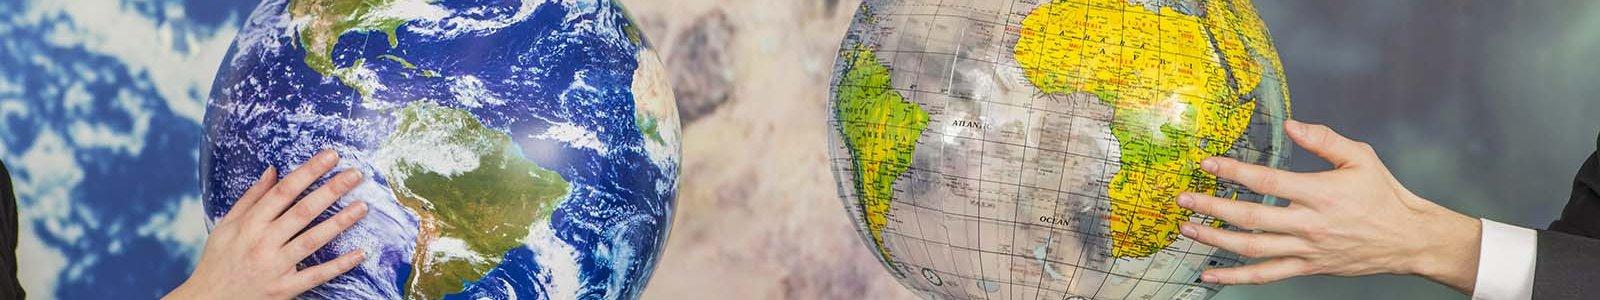 Globes in hands